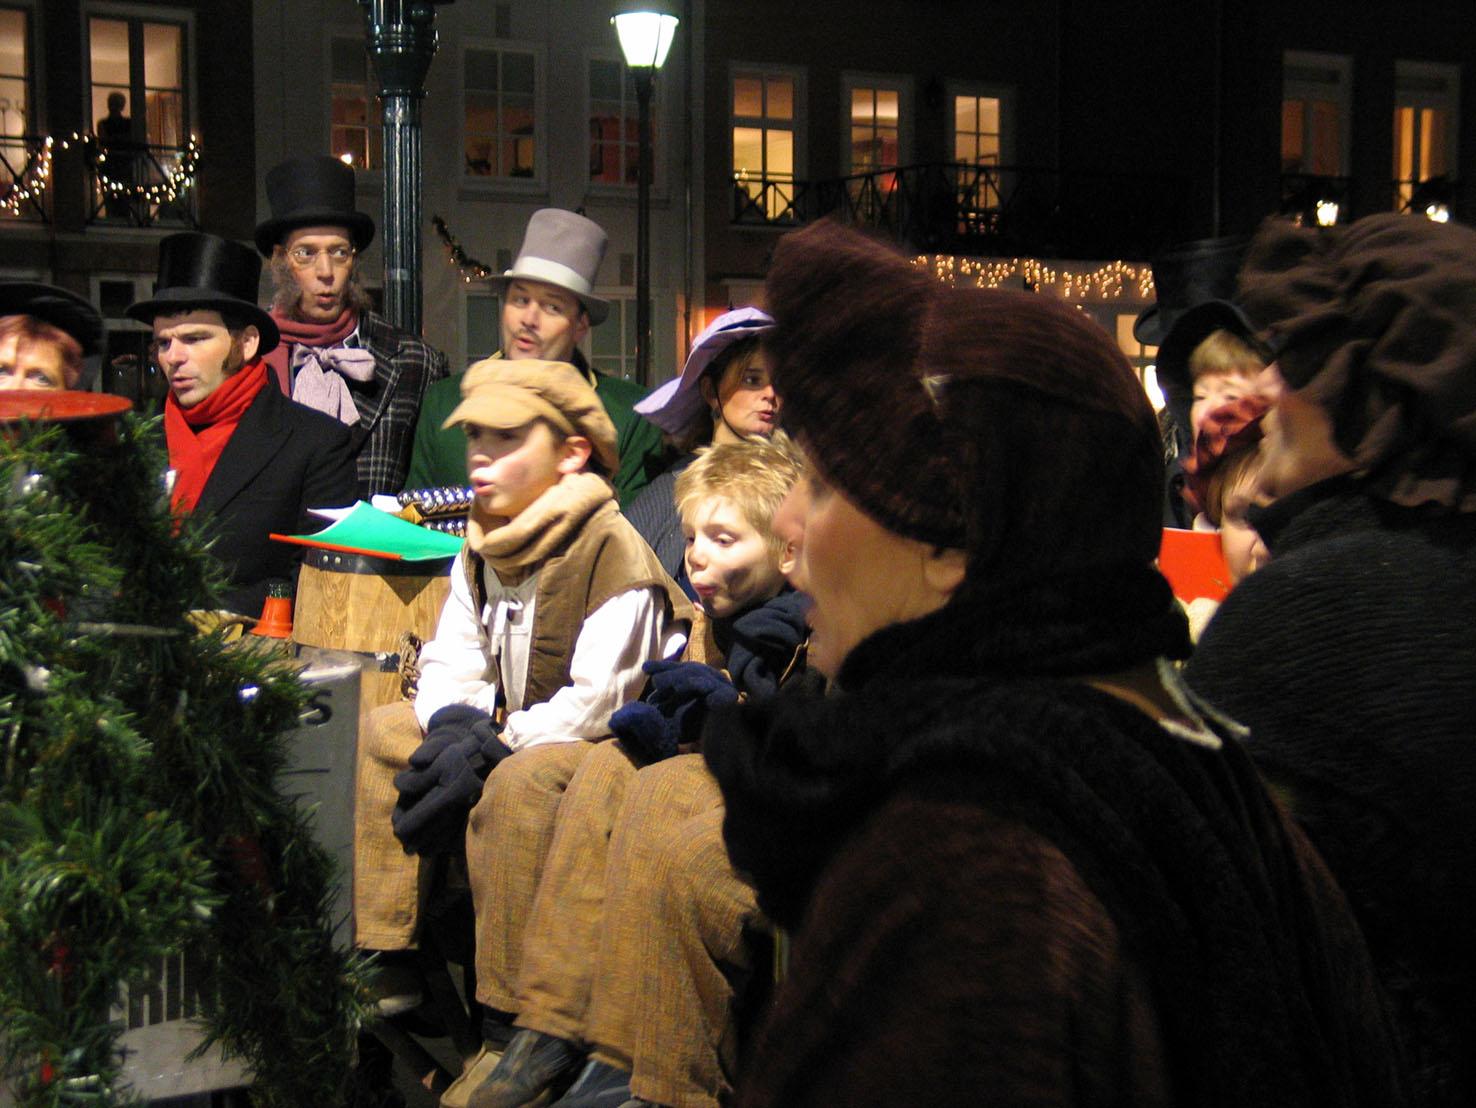 137 - Kerstmarkt Helmond 2003.jpg